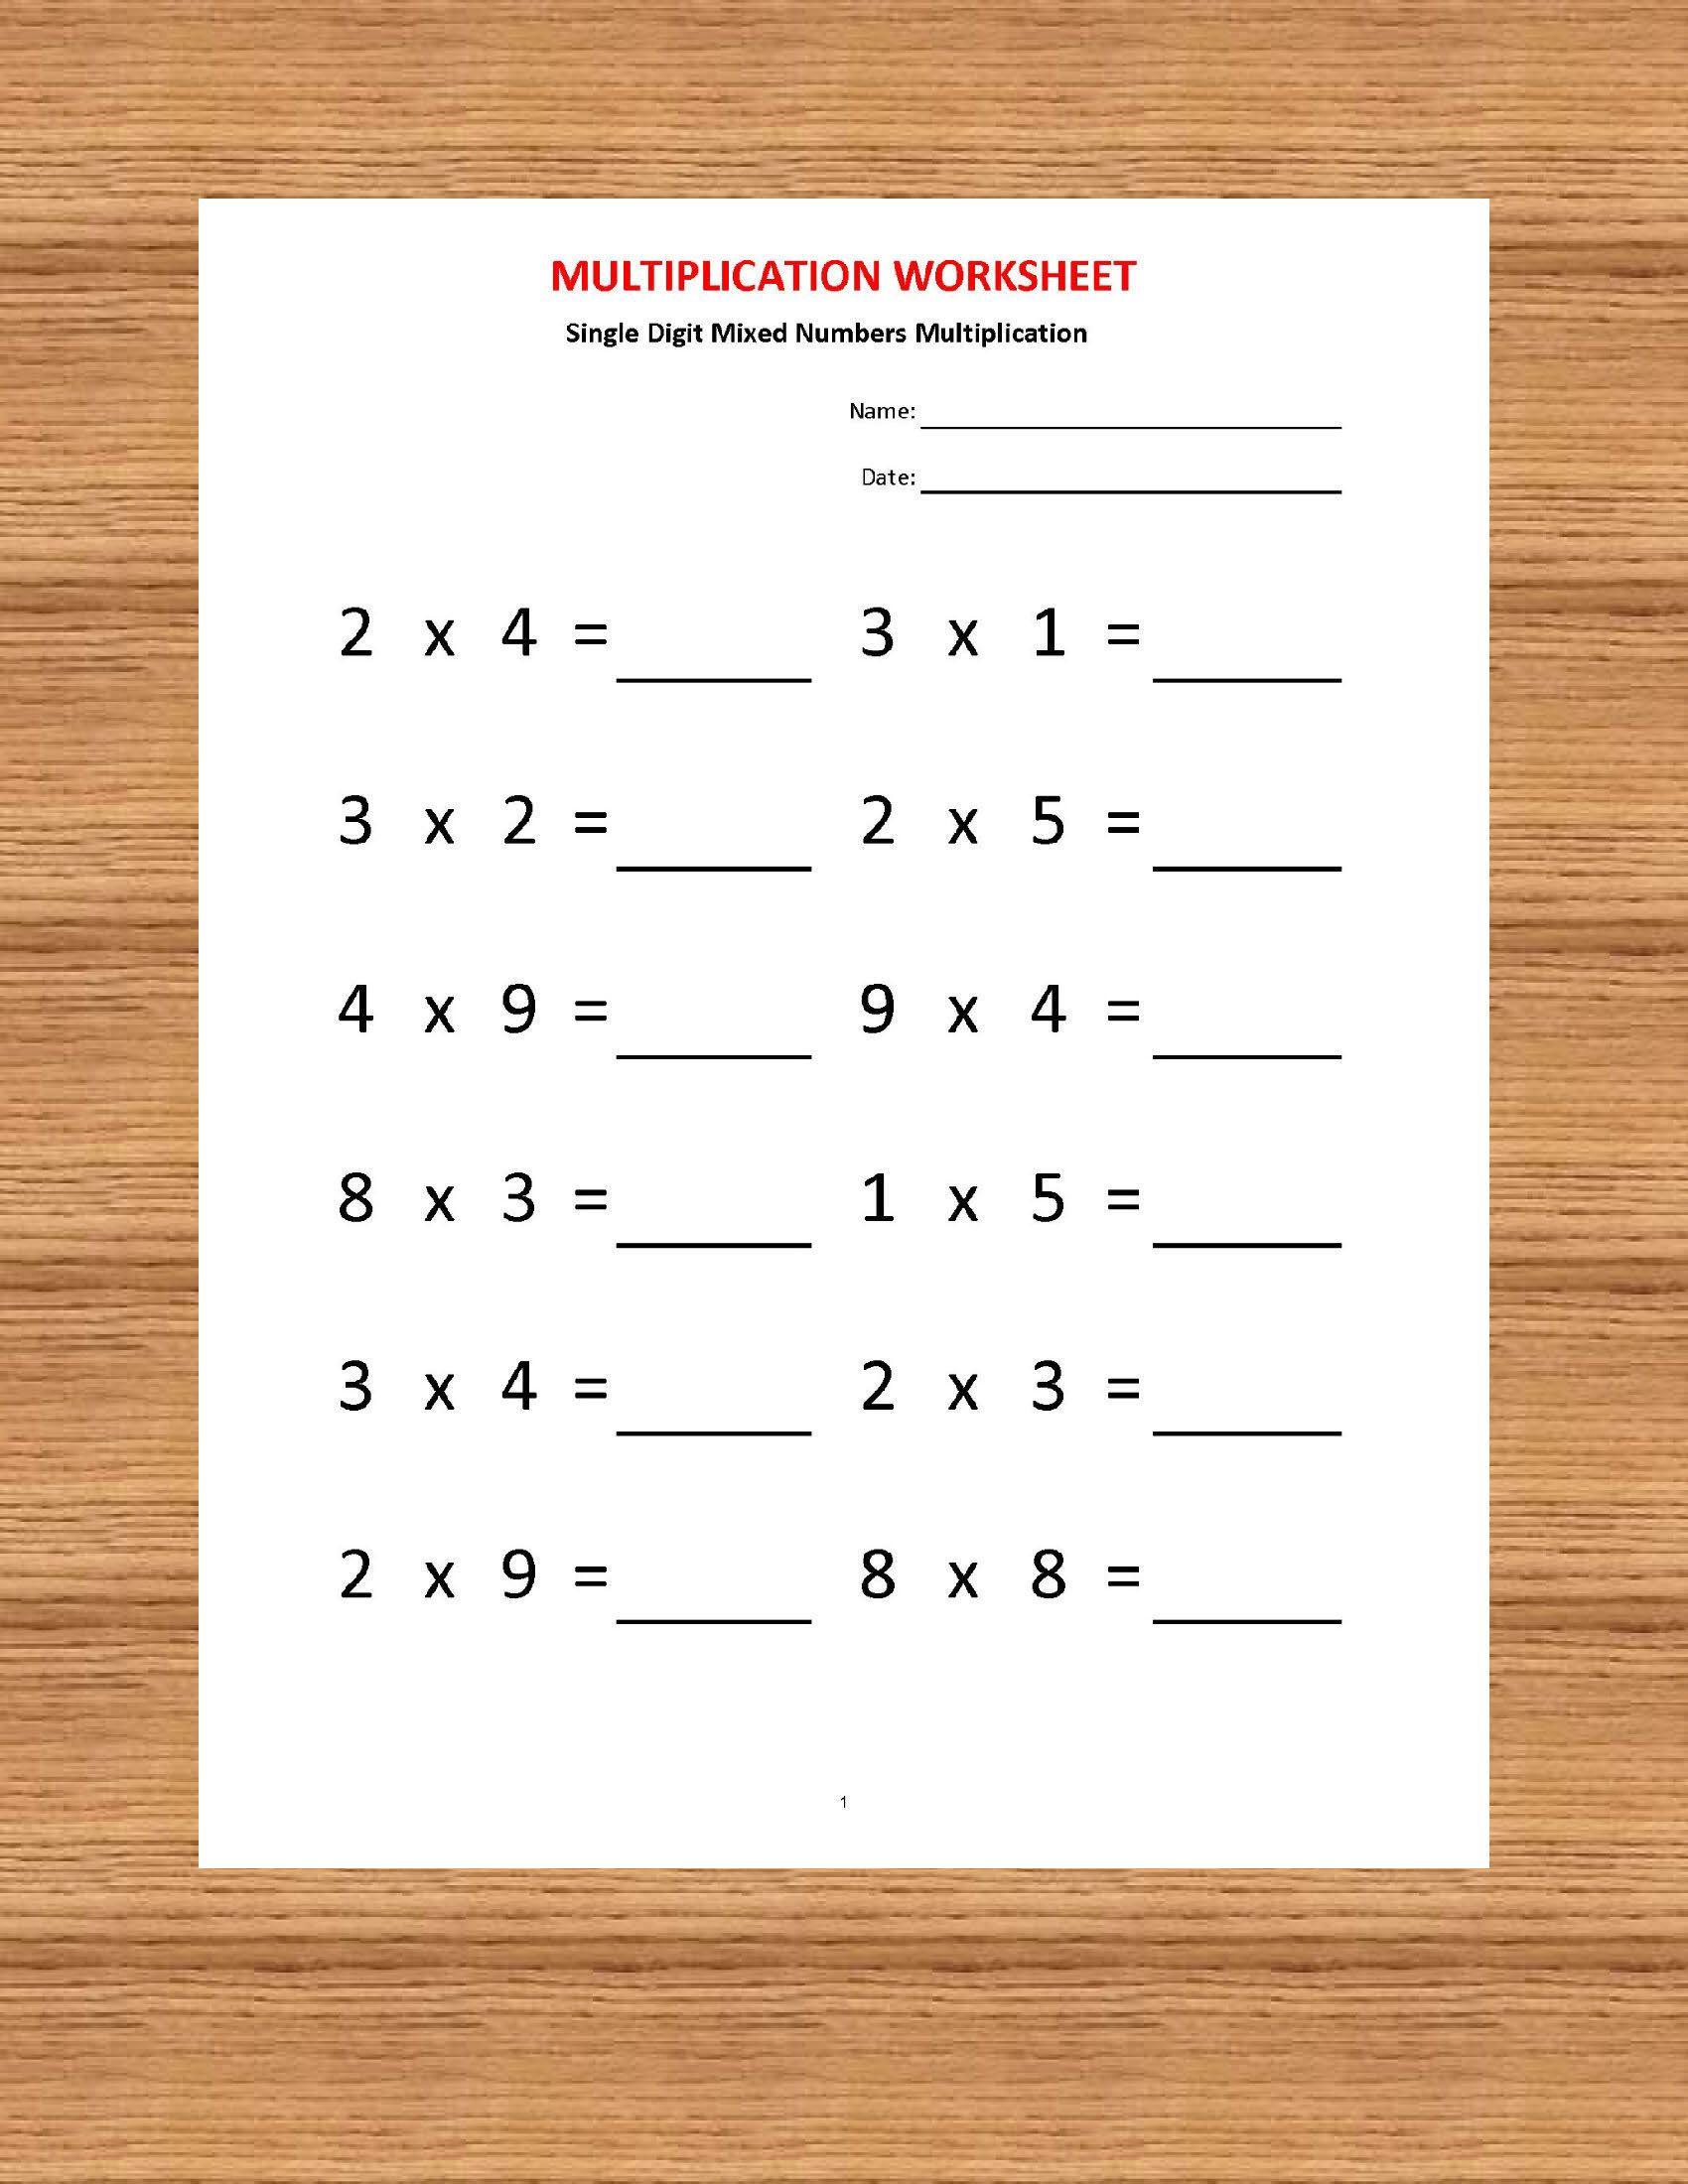 Multiplication Worksheets, Printable Worksheets with Worksheets On Multiplication For Grade 2